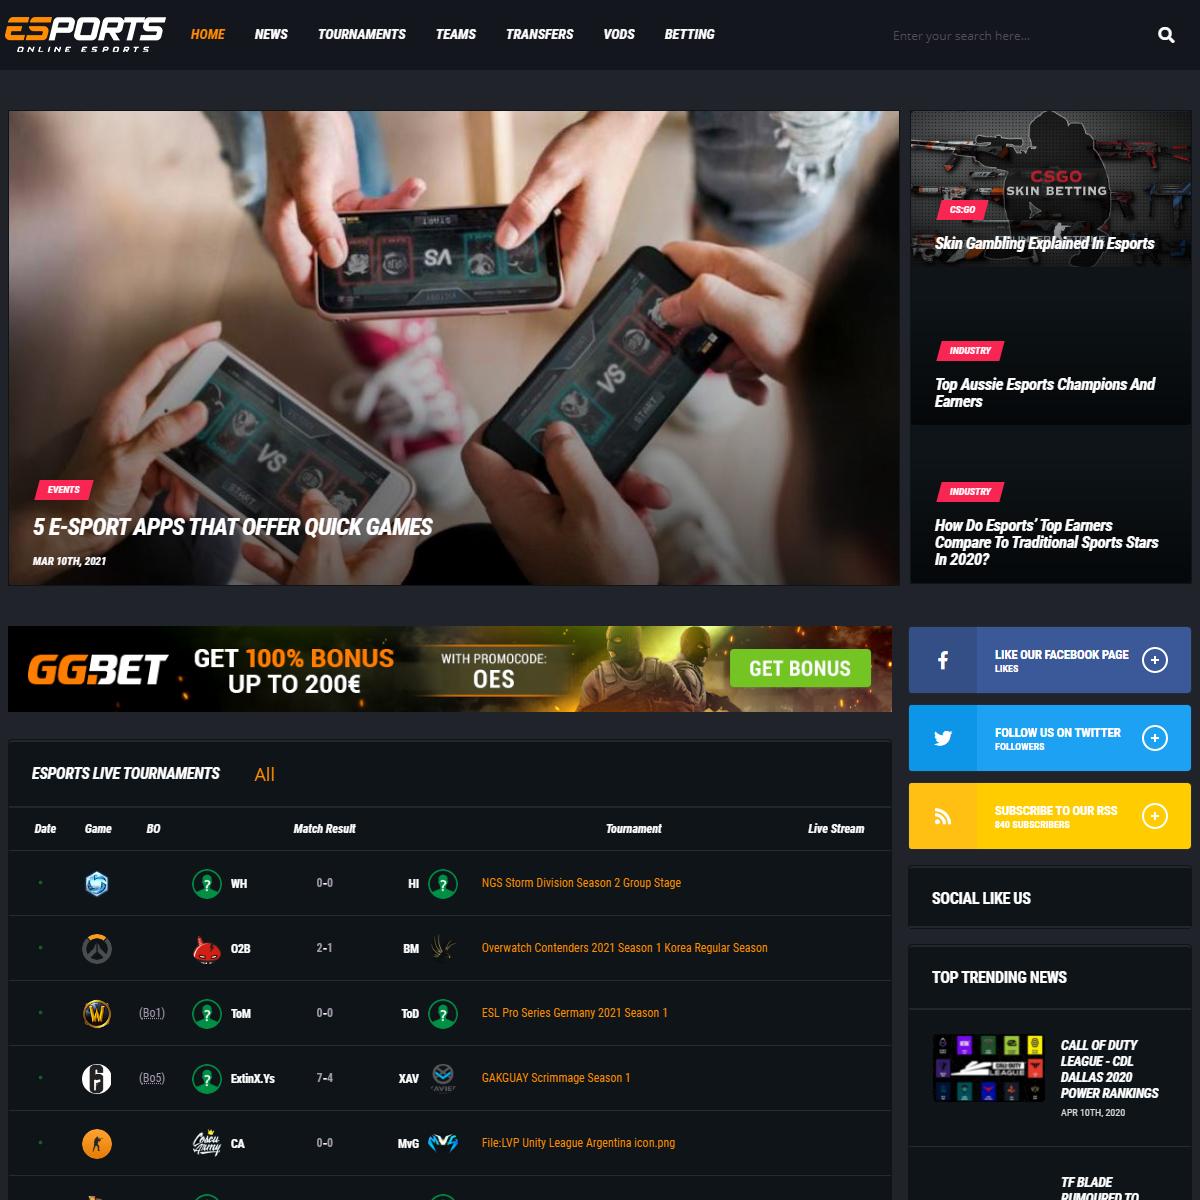 Esports Tournaments - Live Scores, VODS, LOL, Dota 2 Games- OnlineeSports.com